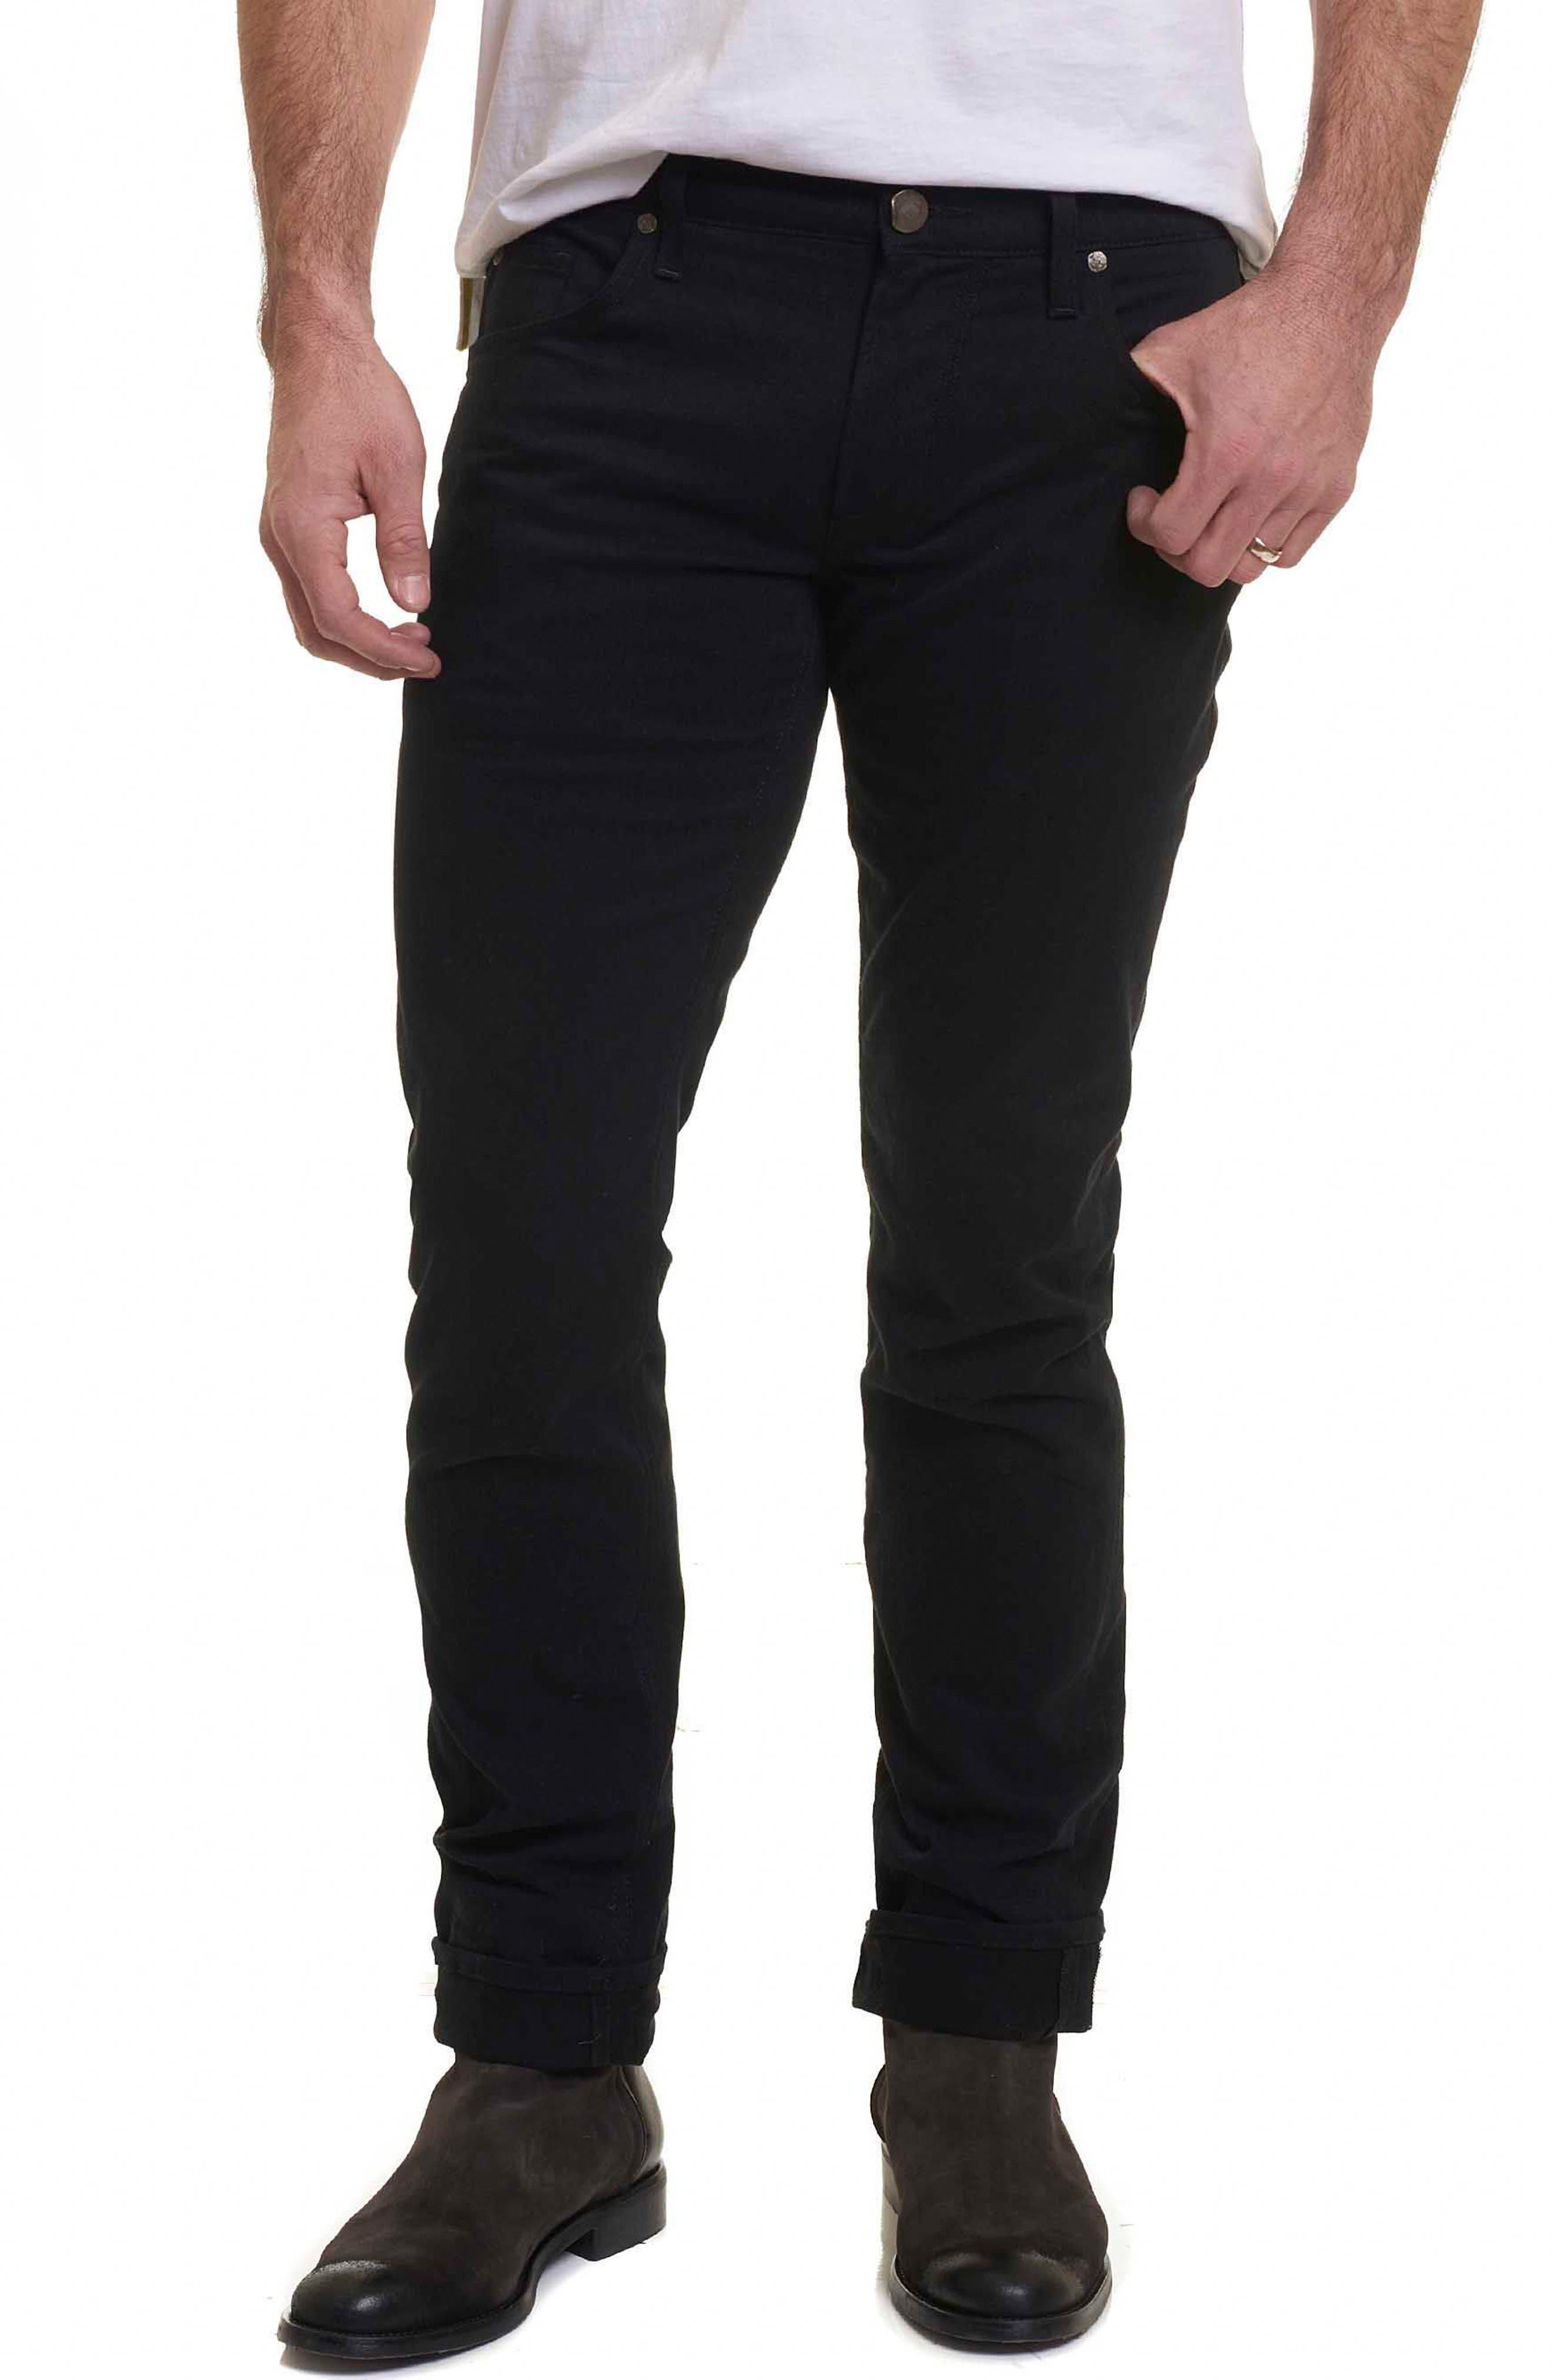 Corwin Classic Fit Jeans,                             Main thumbnail 1, color,                             001